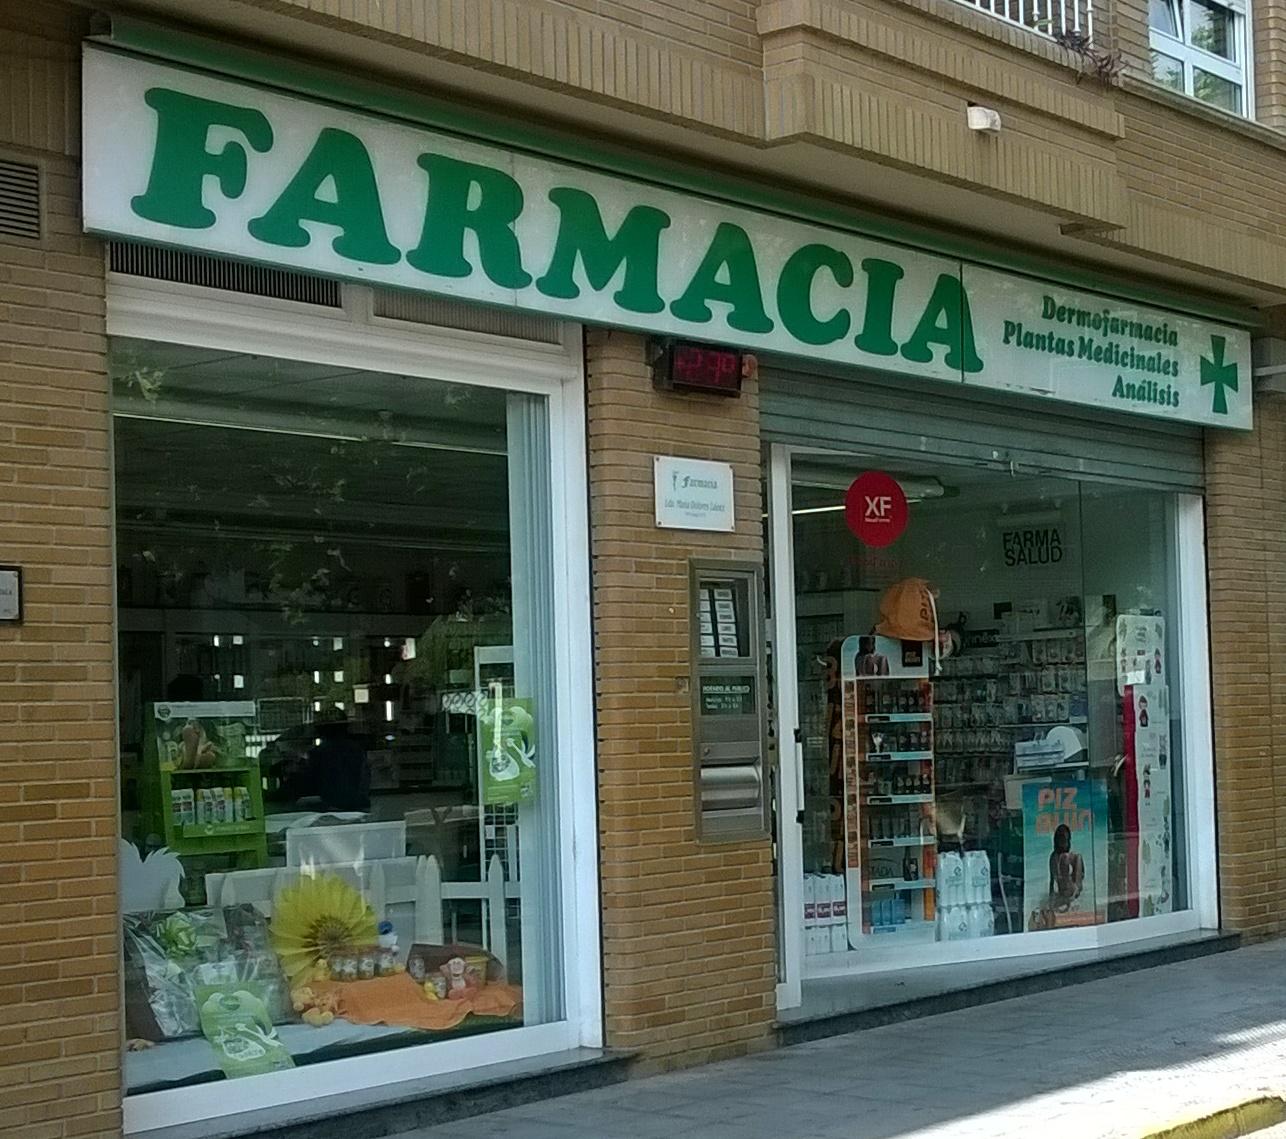 Farmacia María Dolores Lainez Zaragüeta